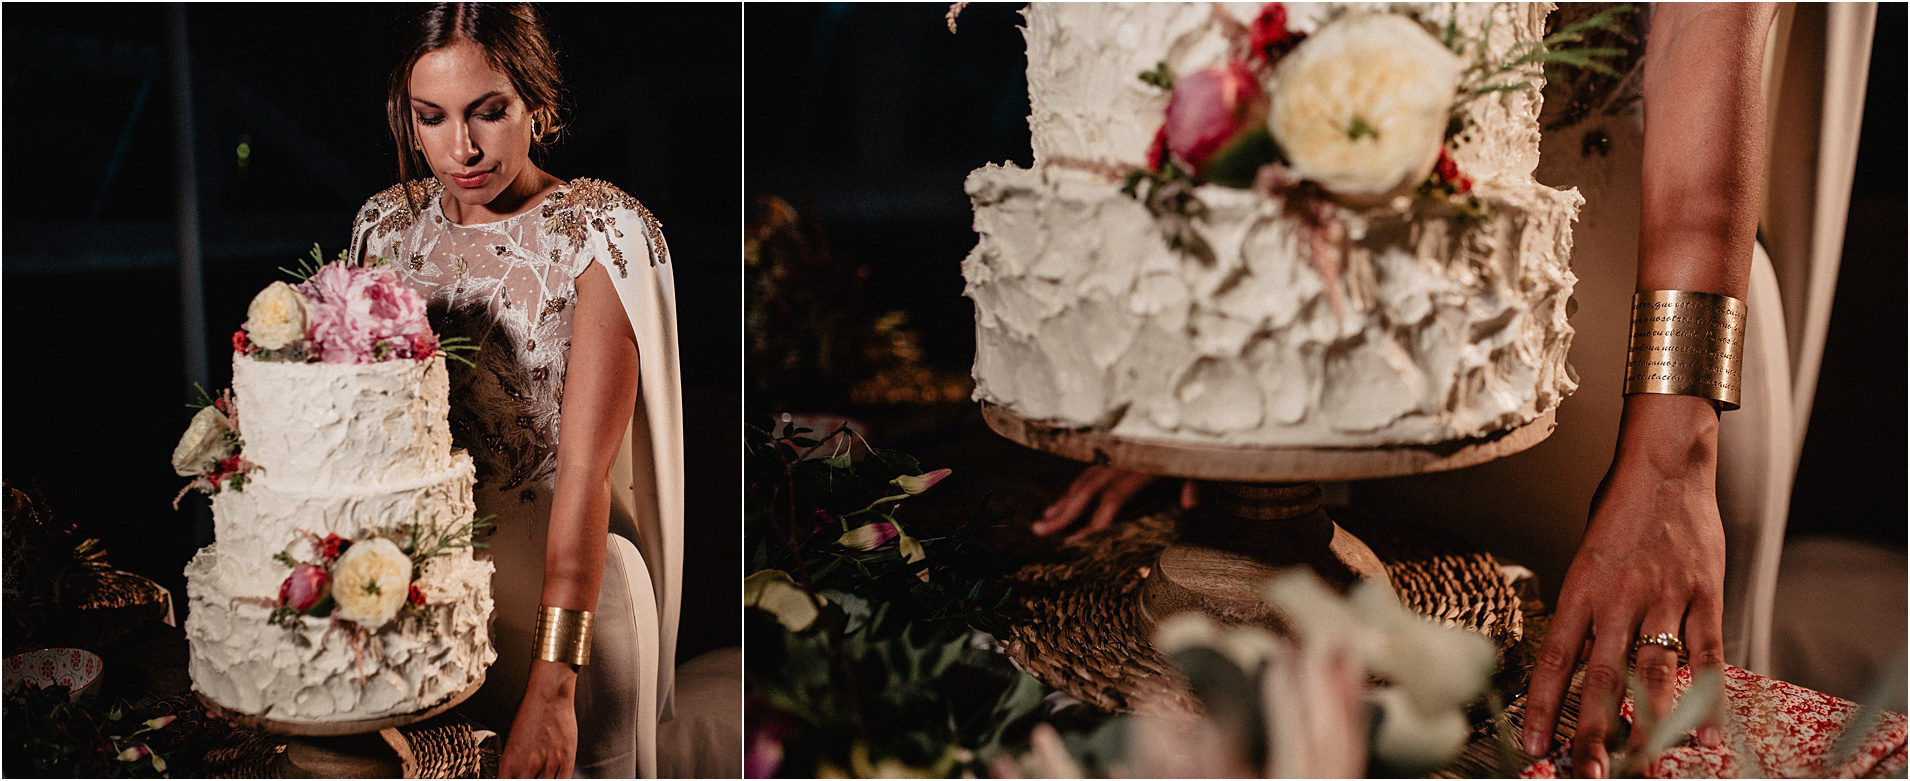 Fotografía y video en Palacio de Arbaisenea Bodas San Sebastián Donostia Guipuzcoa - Finca Arbaisenea by Maher Catering Wedding films and photography-60.jpg